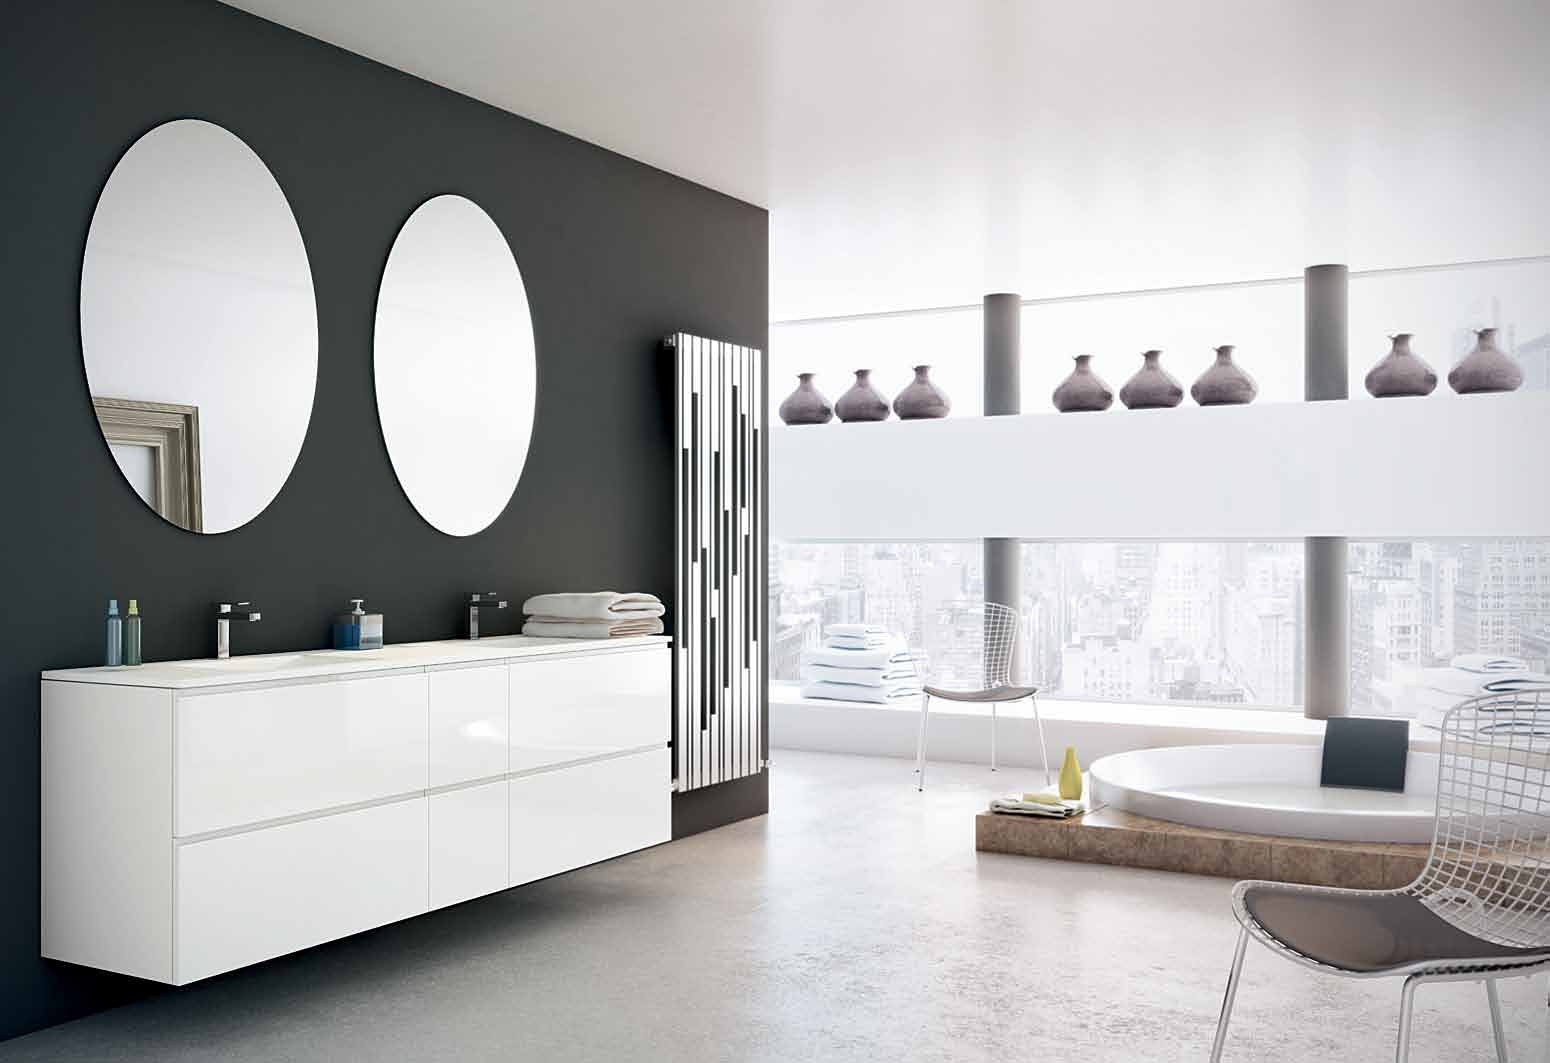 Muebles de bao moderno cool cool muebles para banos disenoerno alicante sala salon sala for Muebles baratos alicante